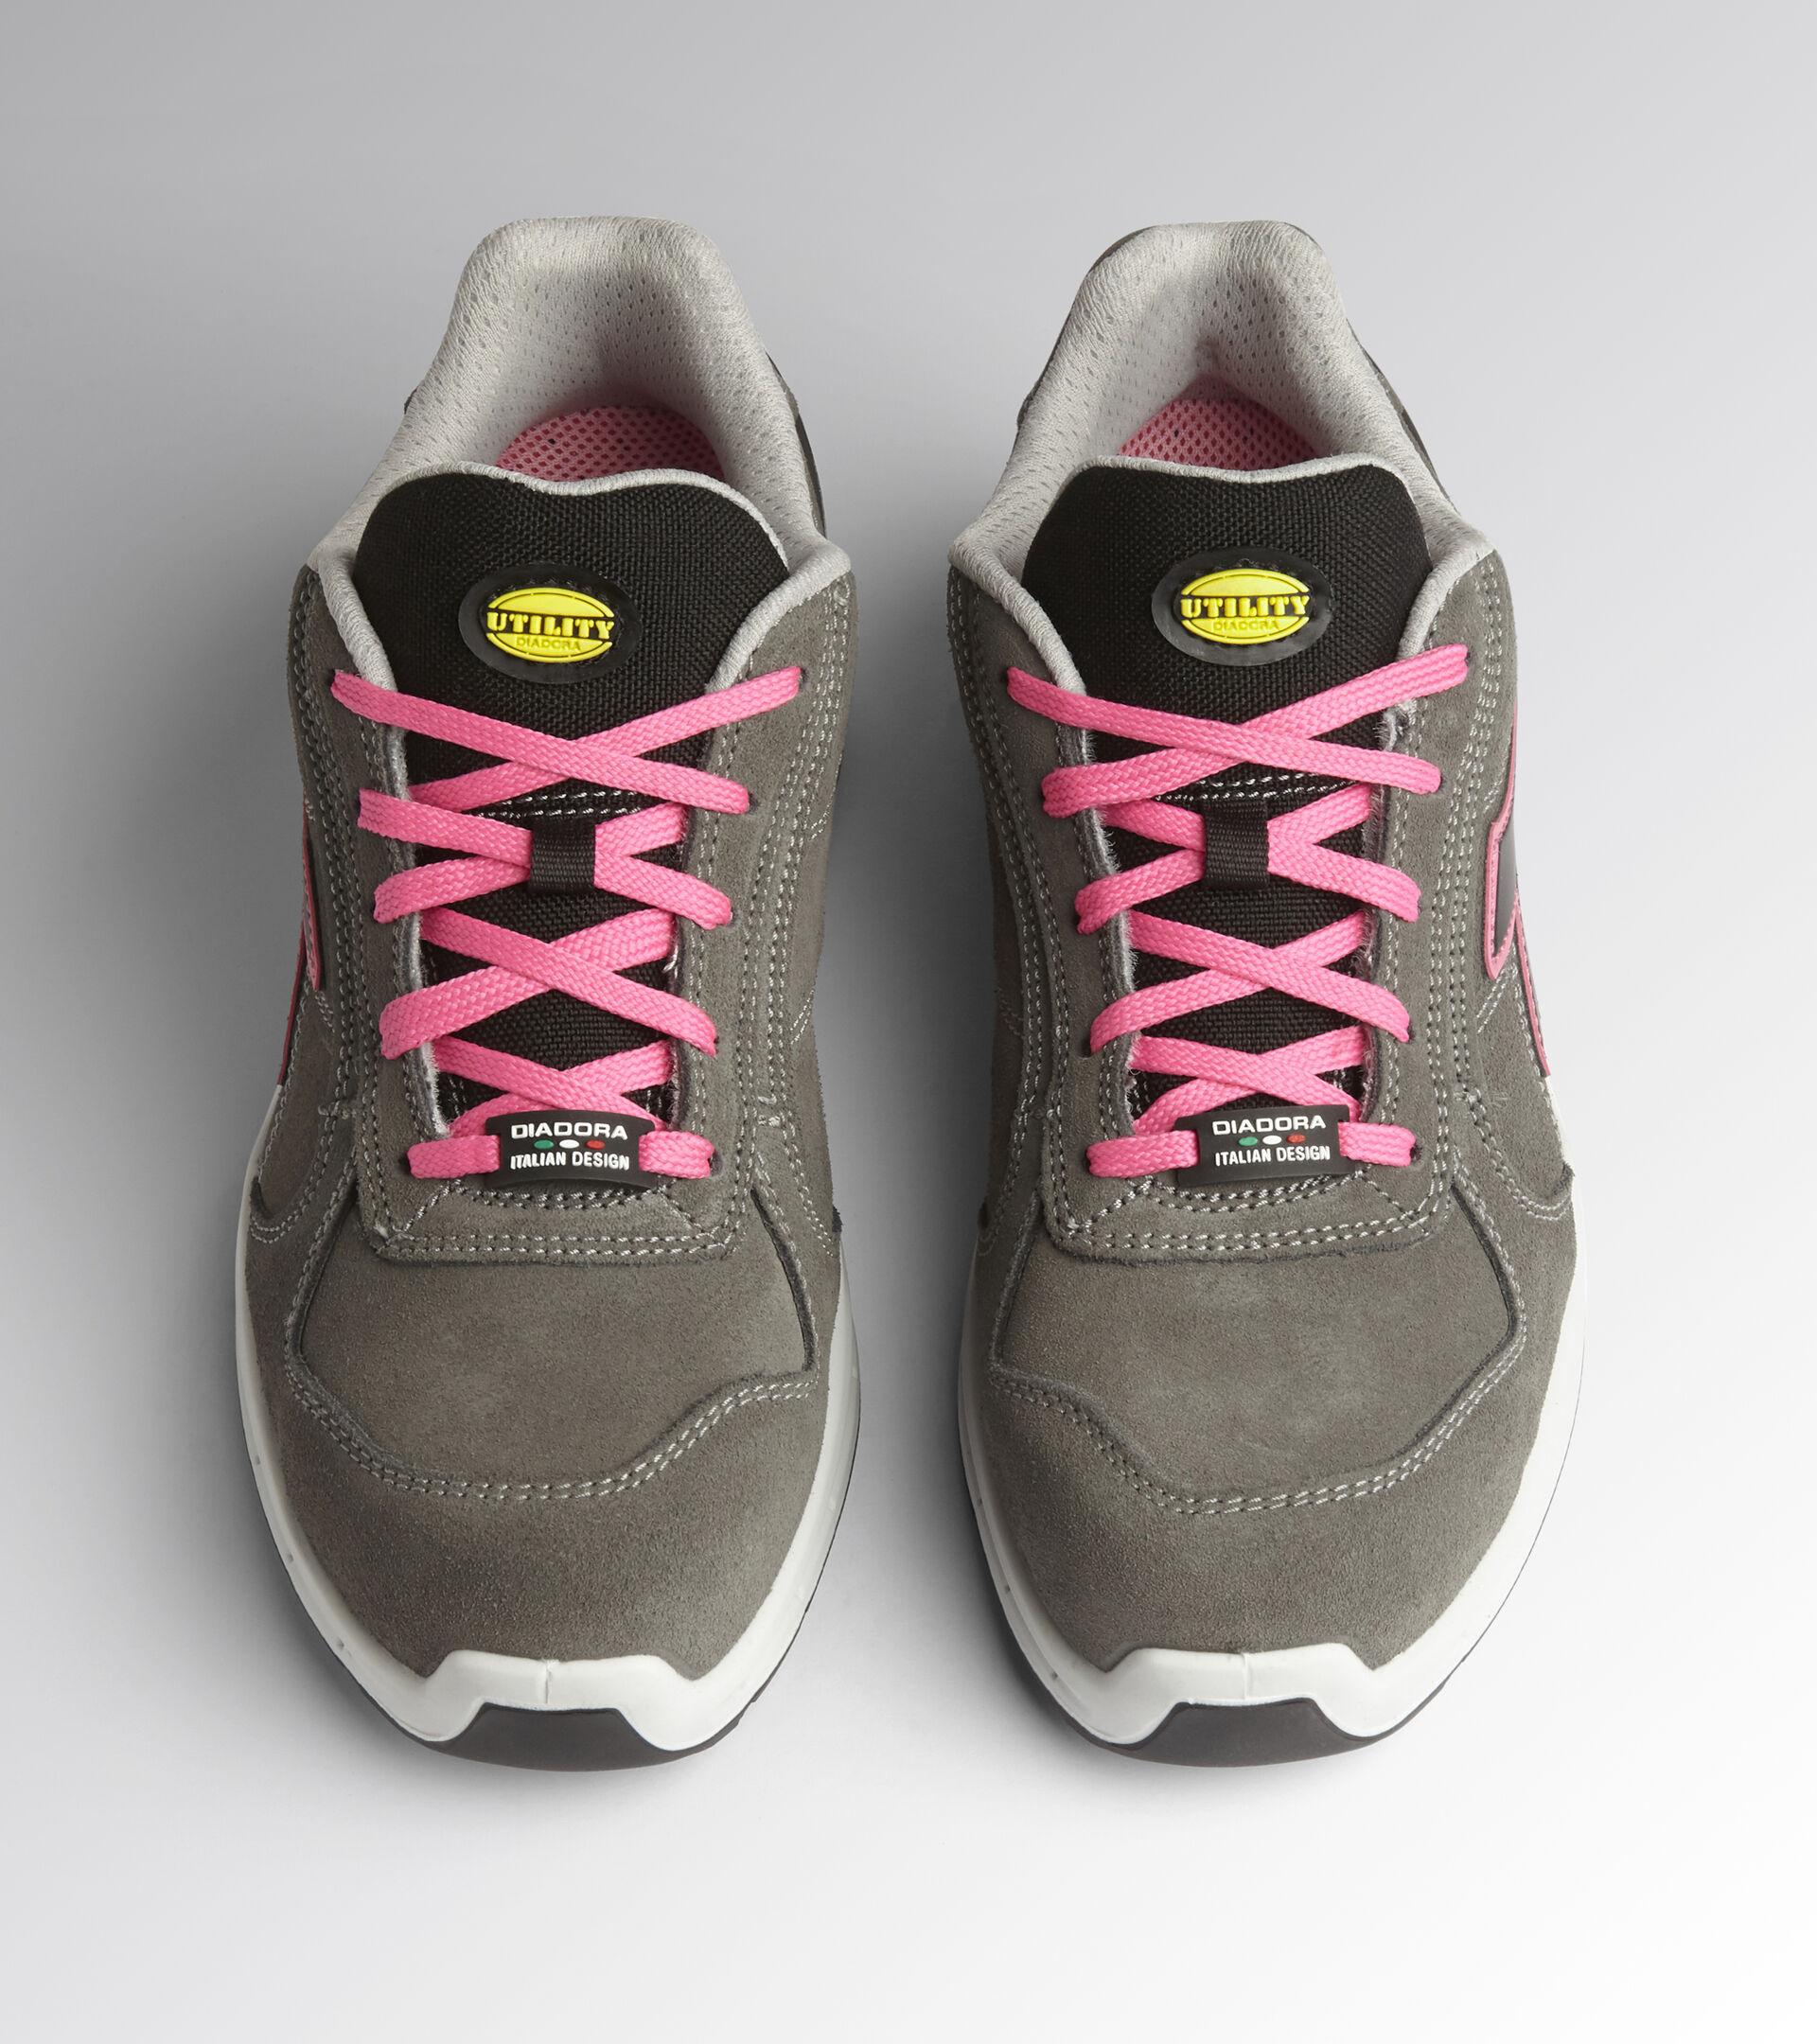 Footwear Utility UNISEX RUN NET AIRBOX LOW S3 SRC SMOKE/SMOKE Utility